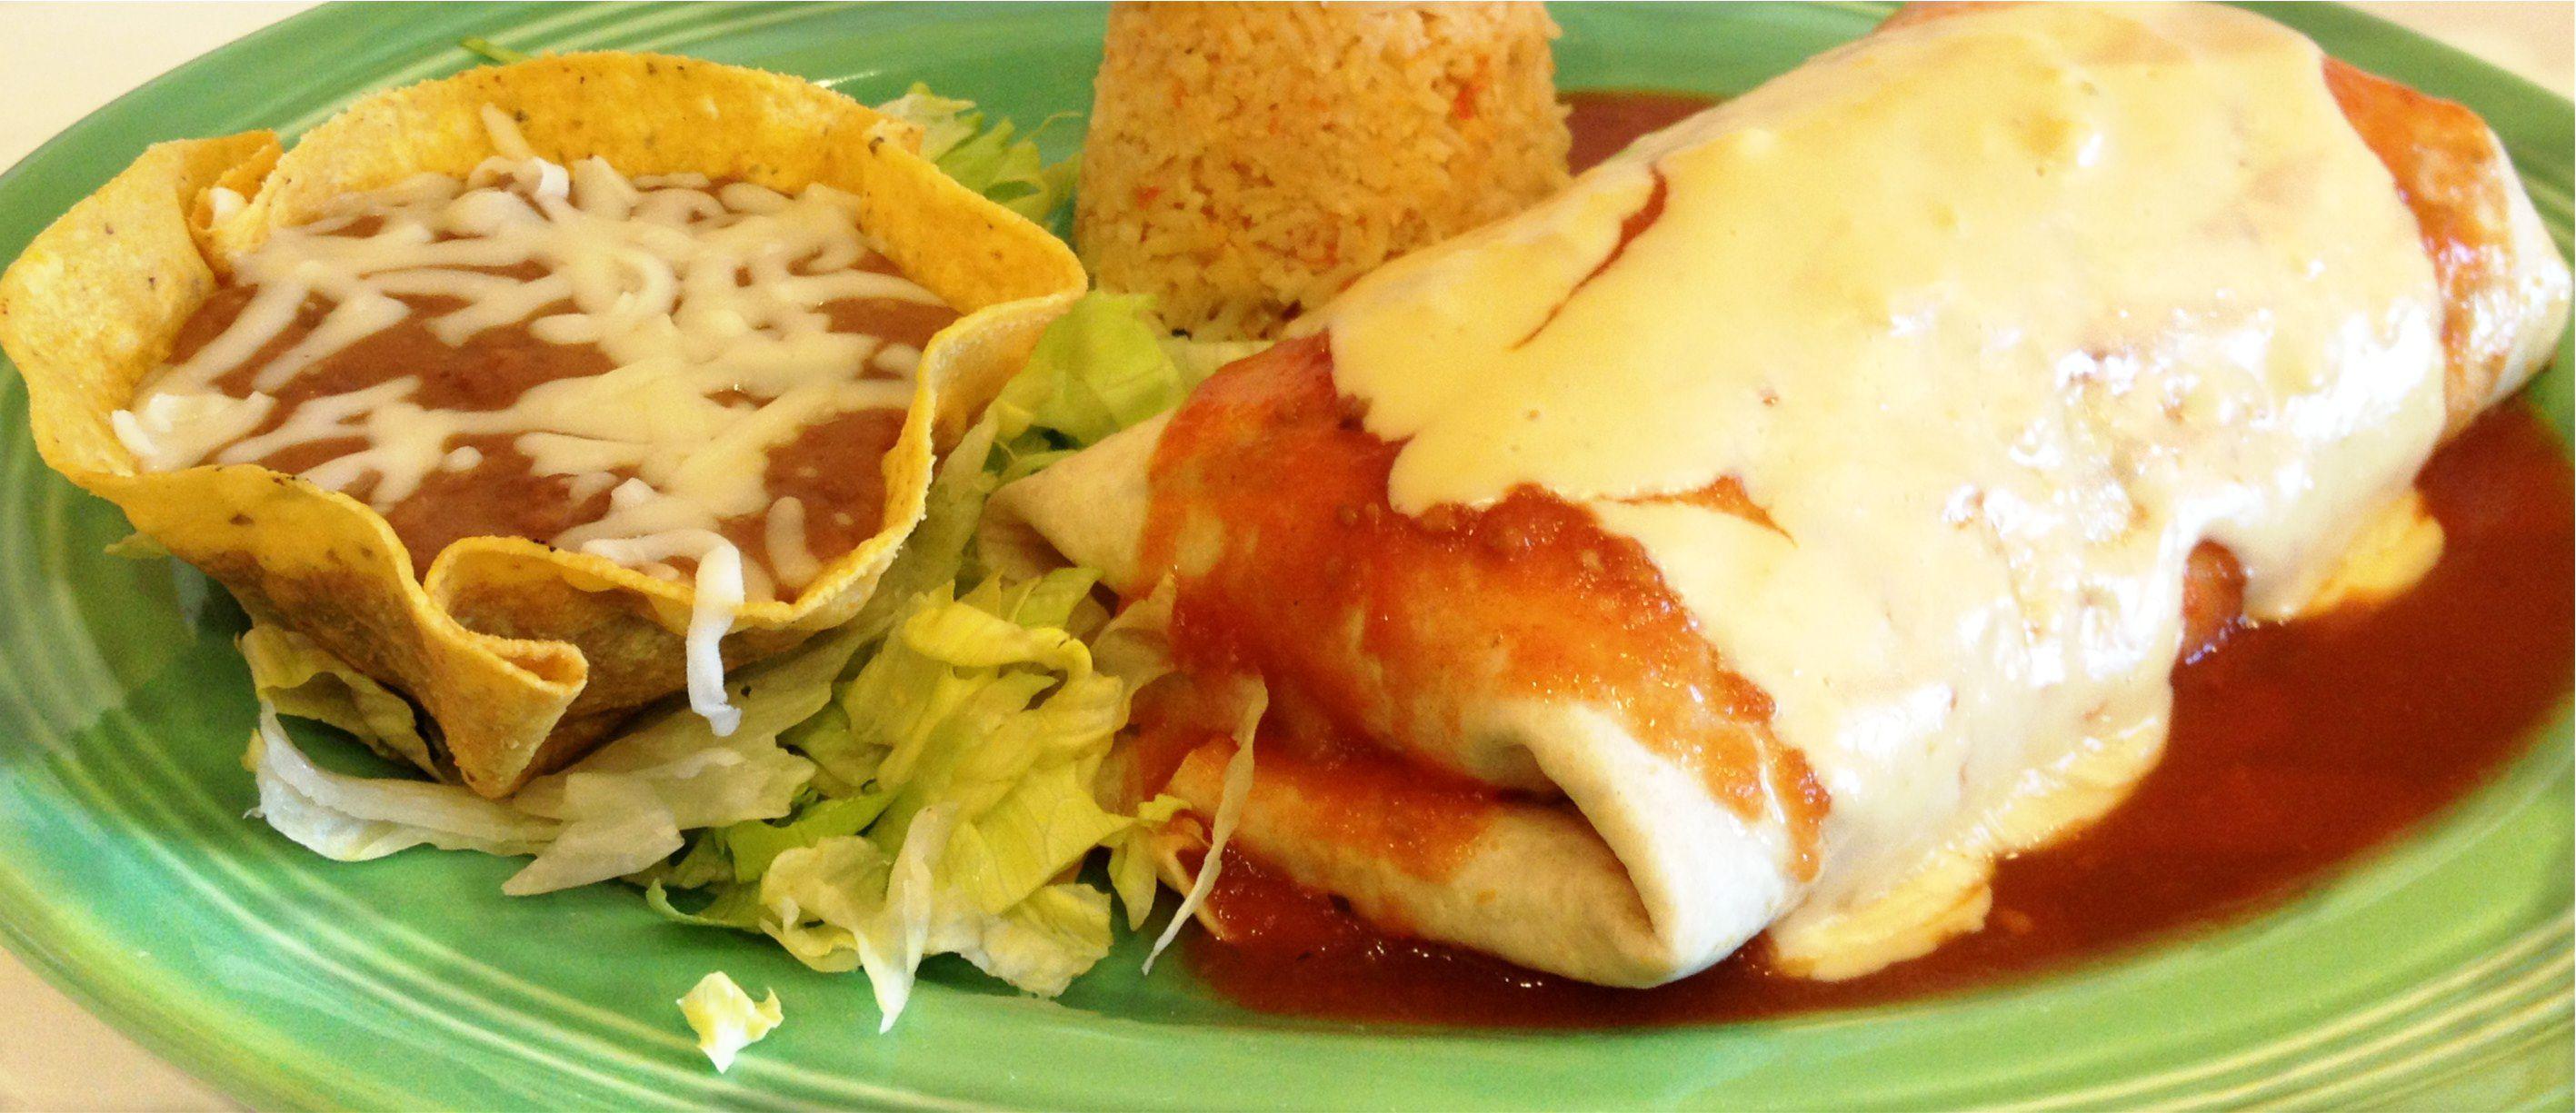 Fajita Burrito Image